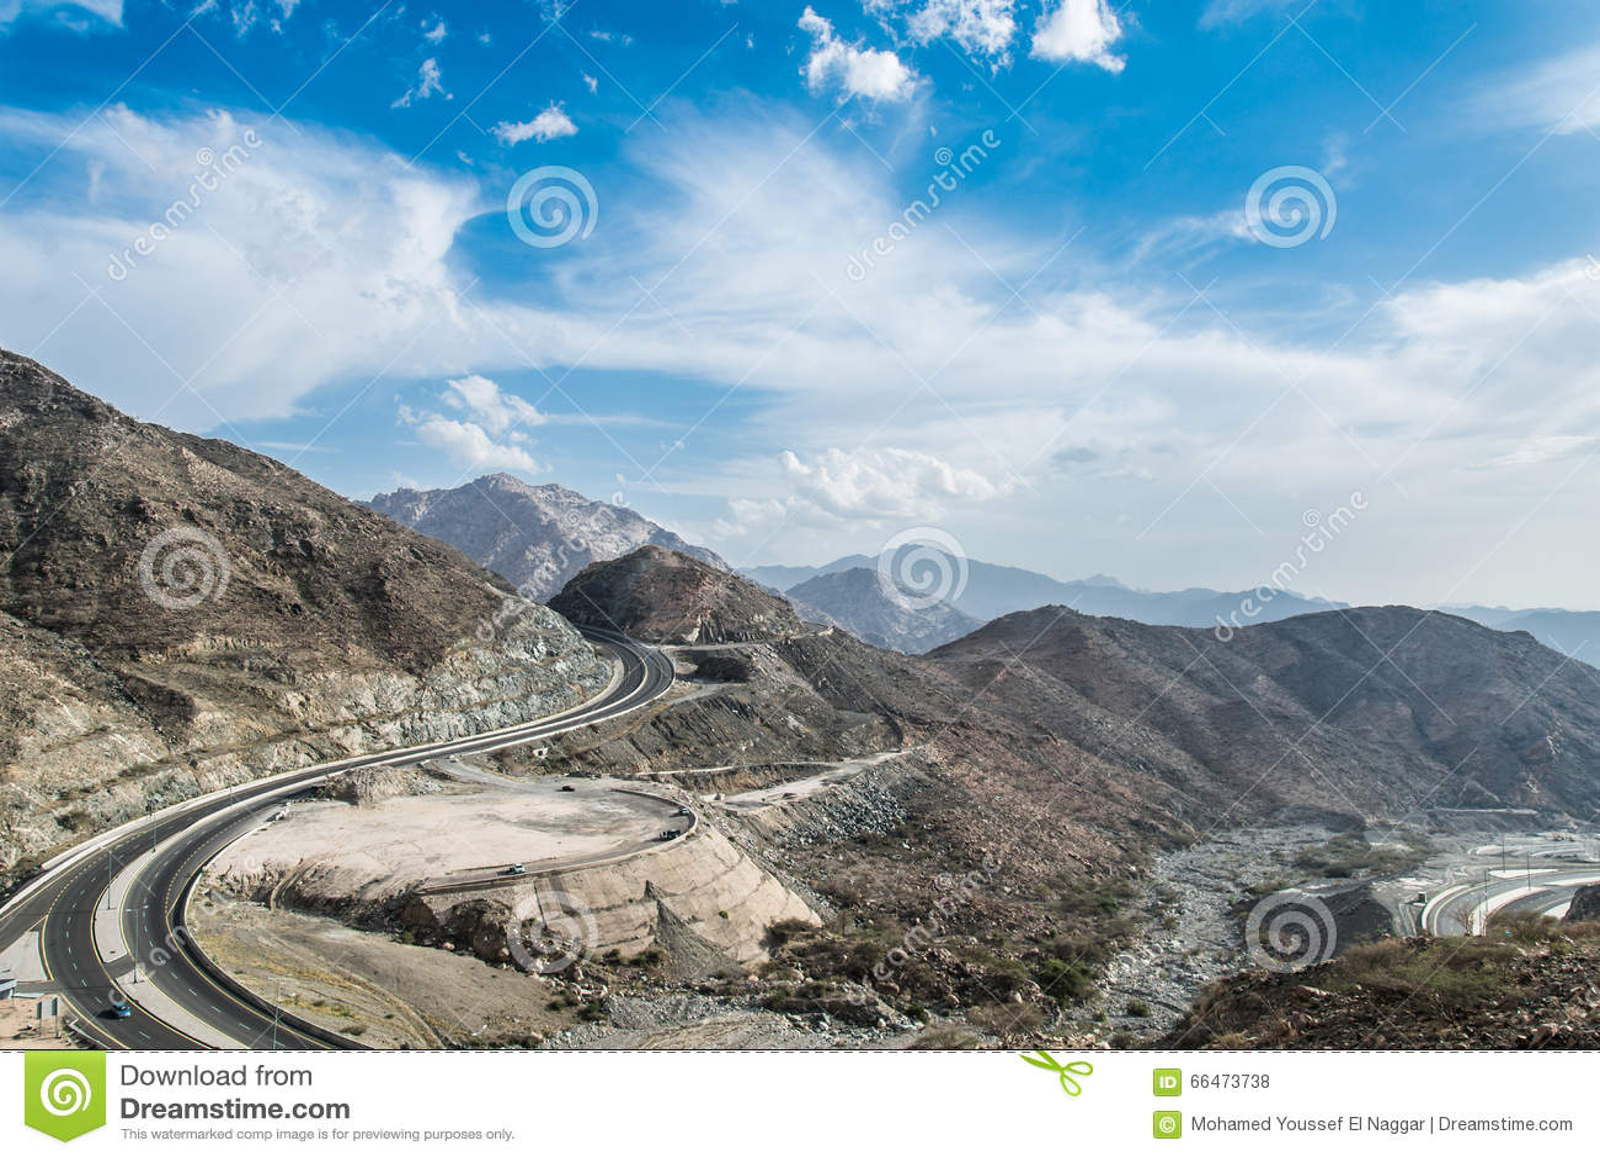 Al Hada Saudi Arabia  City pictures : Al Hada Mountains in Ta'if city in Mecca Province of Saudi Arabia.